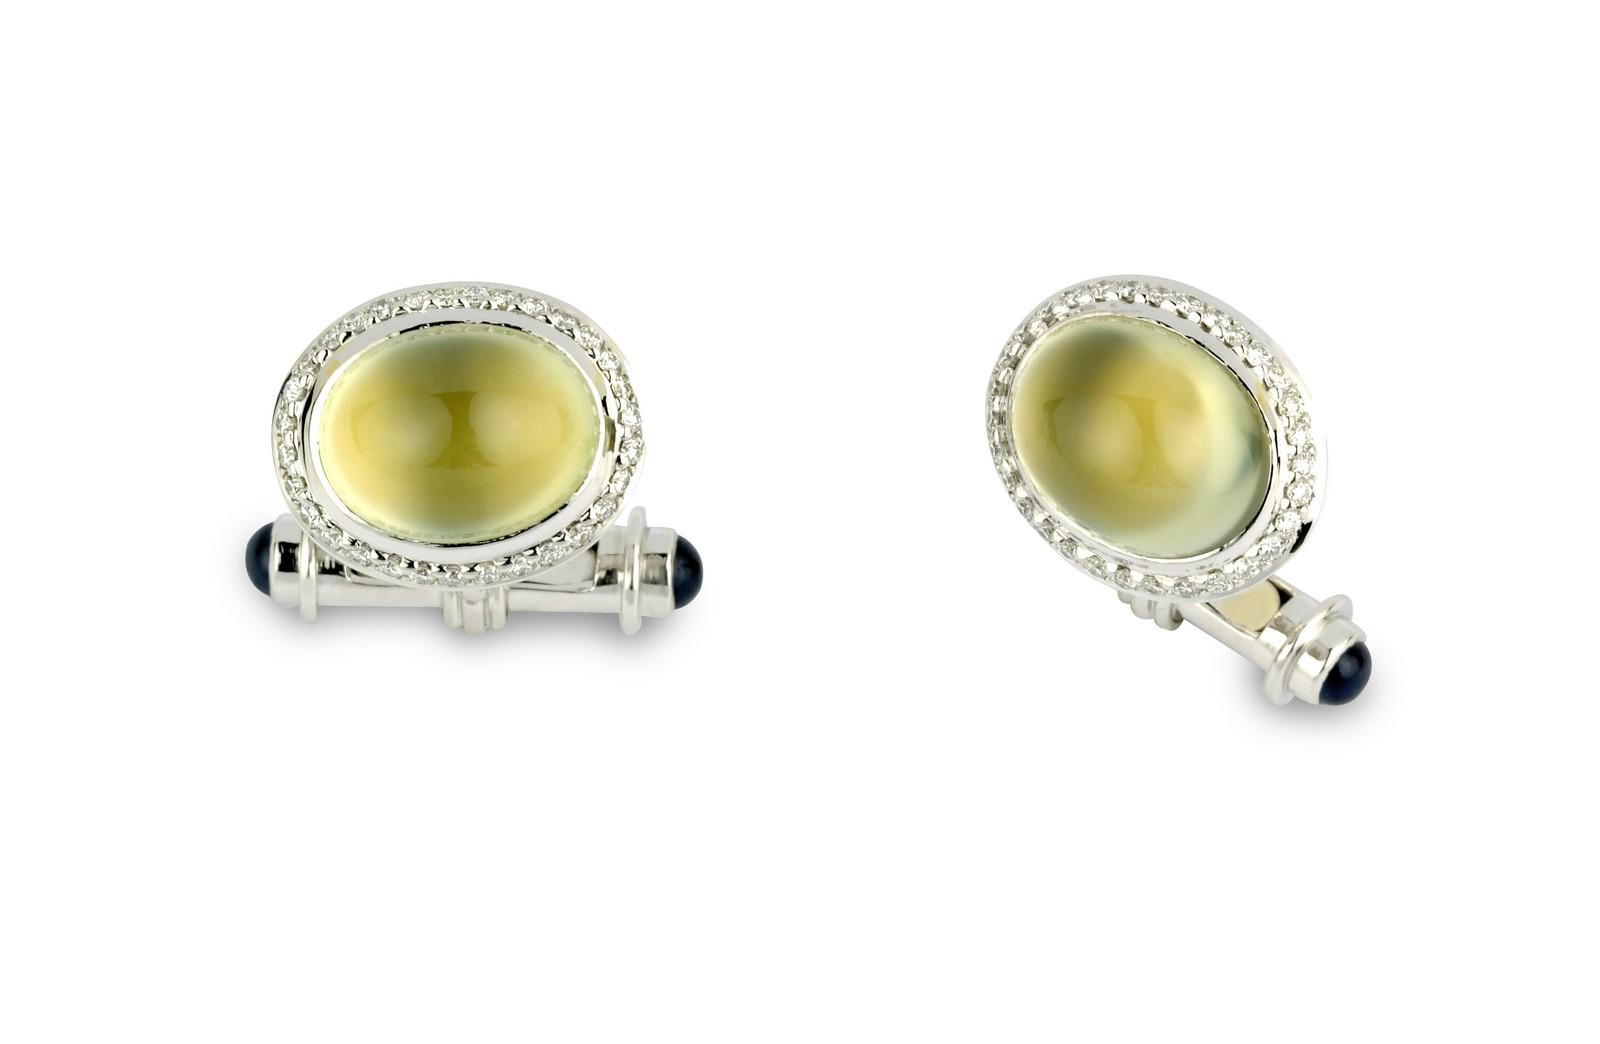 18ct White Gold Cufflinks with Prehnite